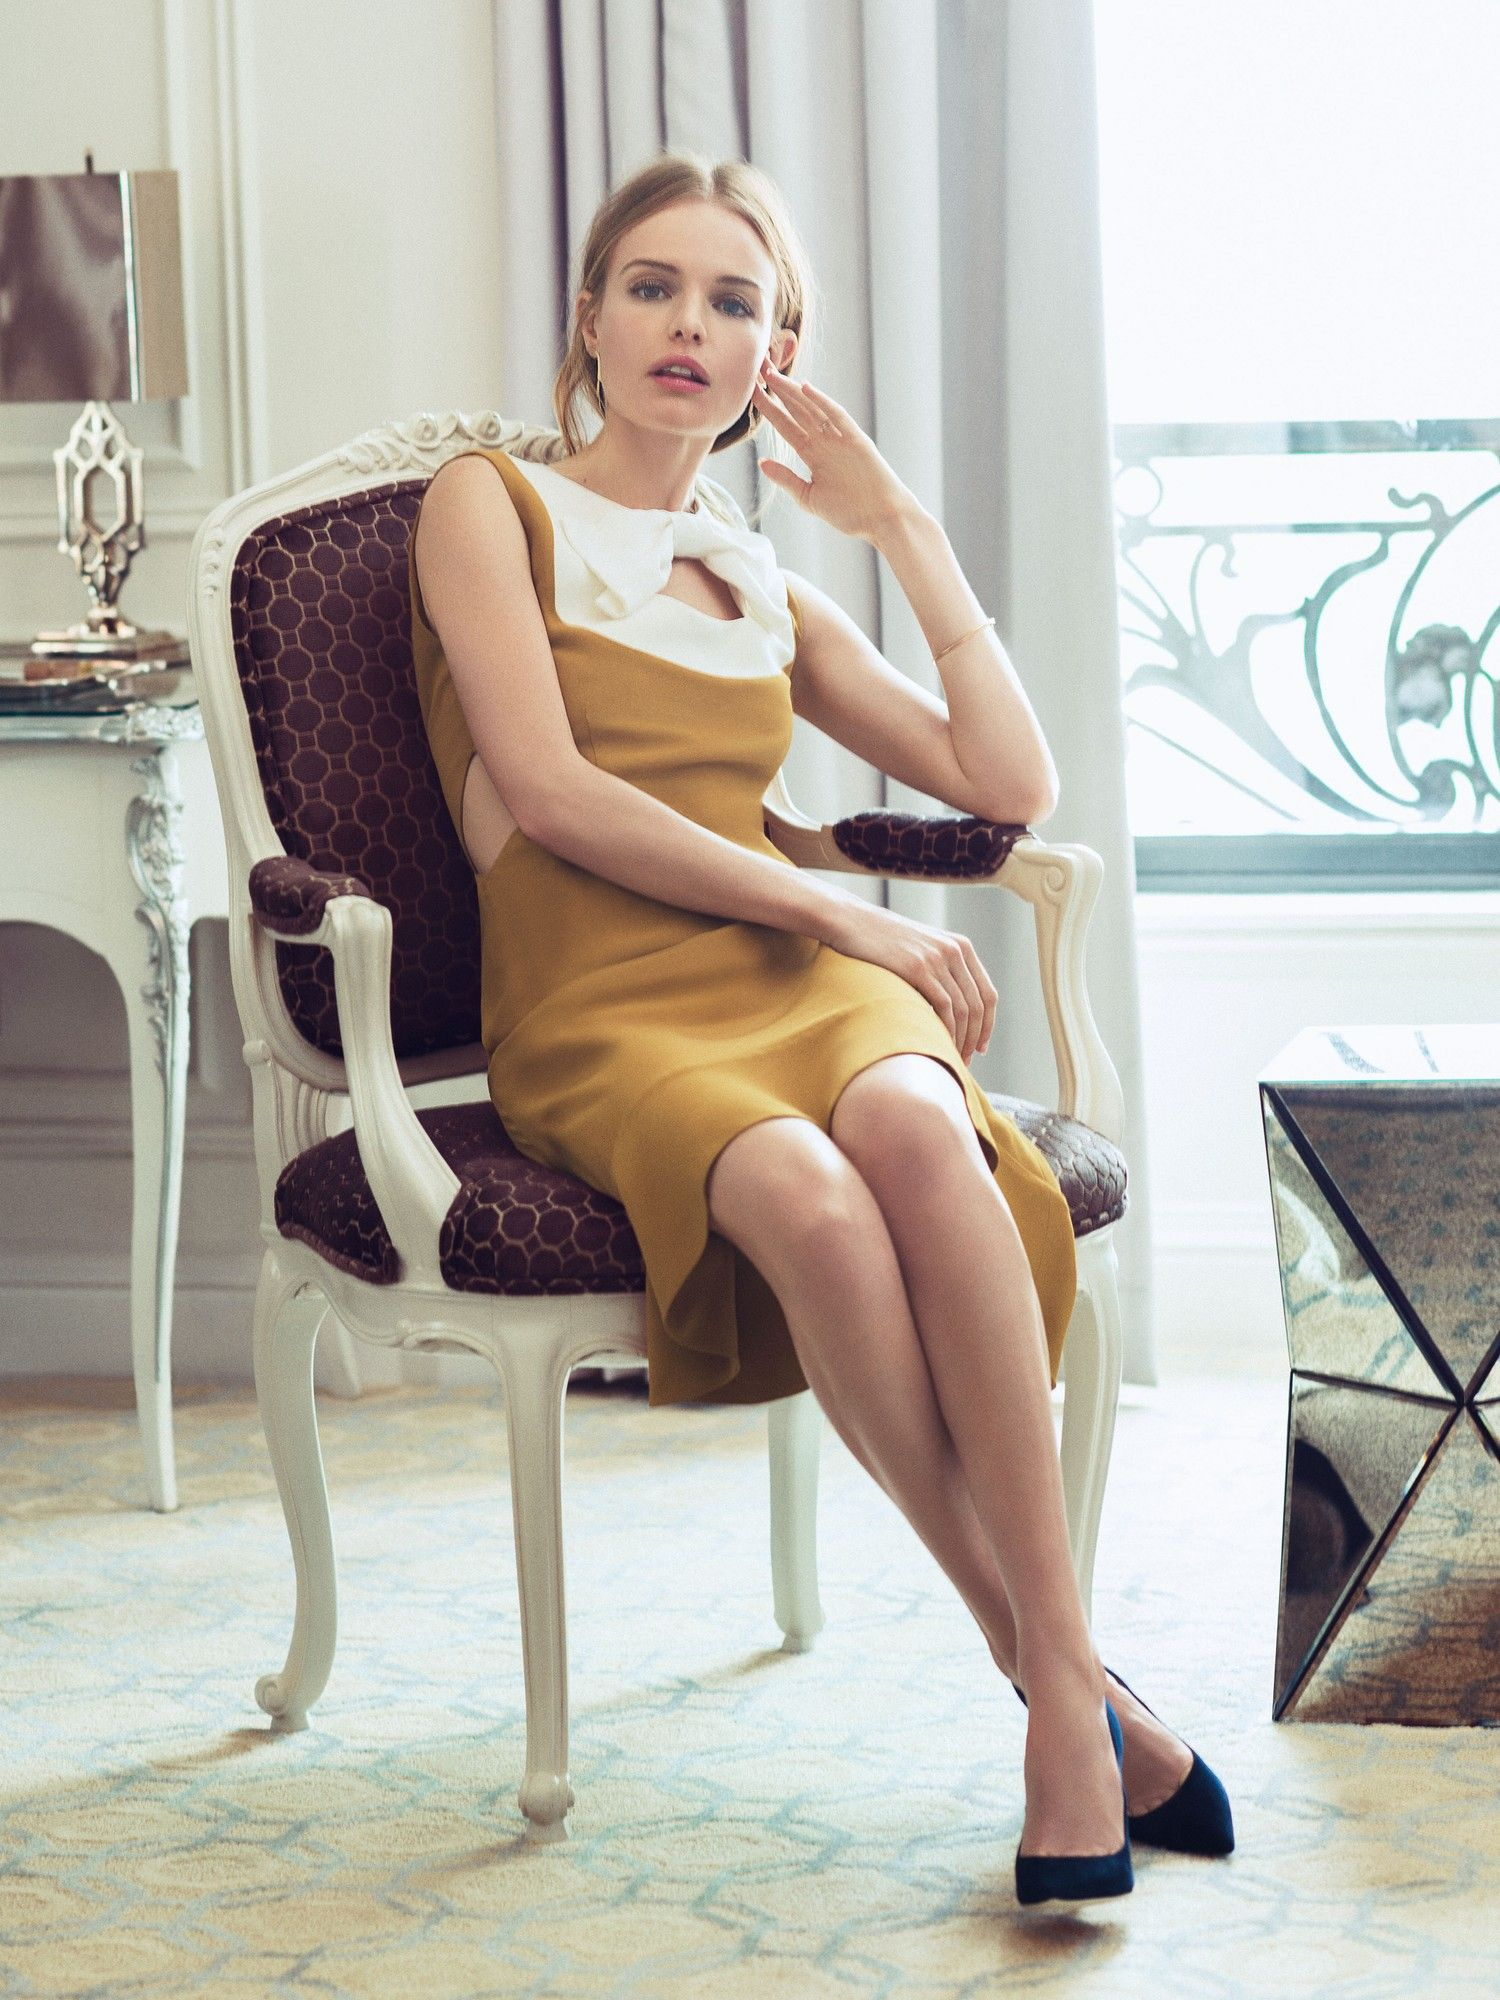 kate bosworth by sebastian kim photoshoot for lucky magazine november 2013